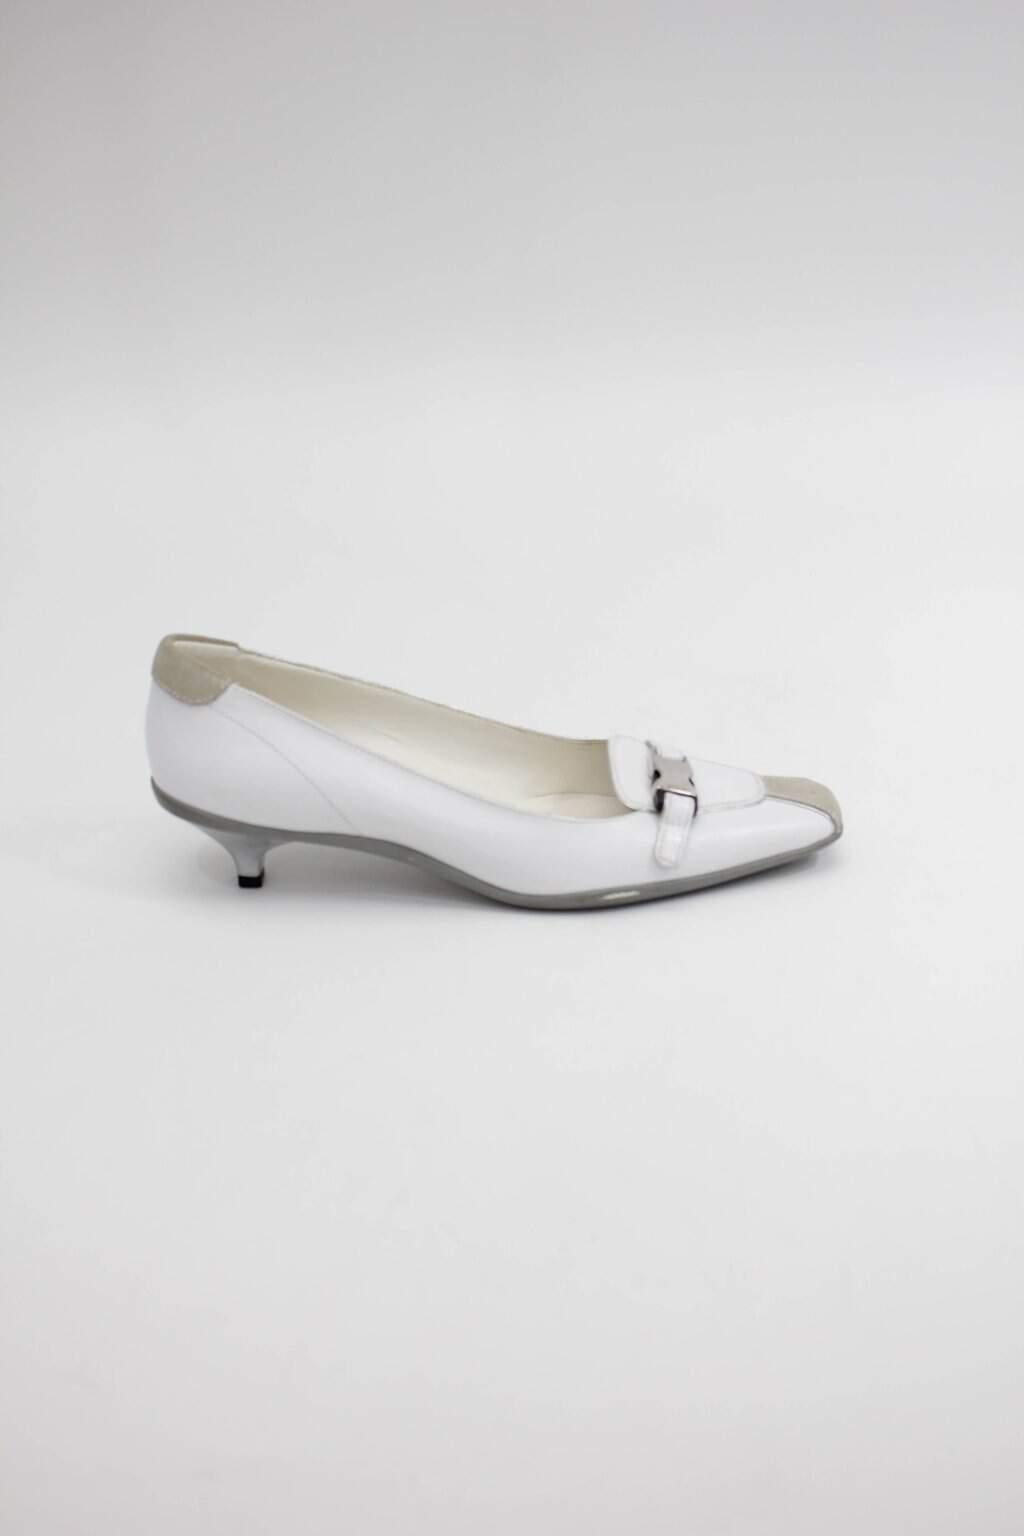 Sapato Prada Feminino Branco